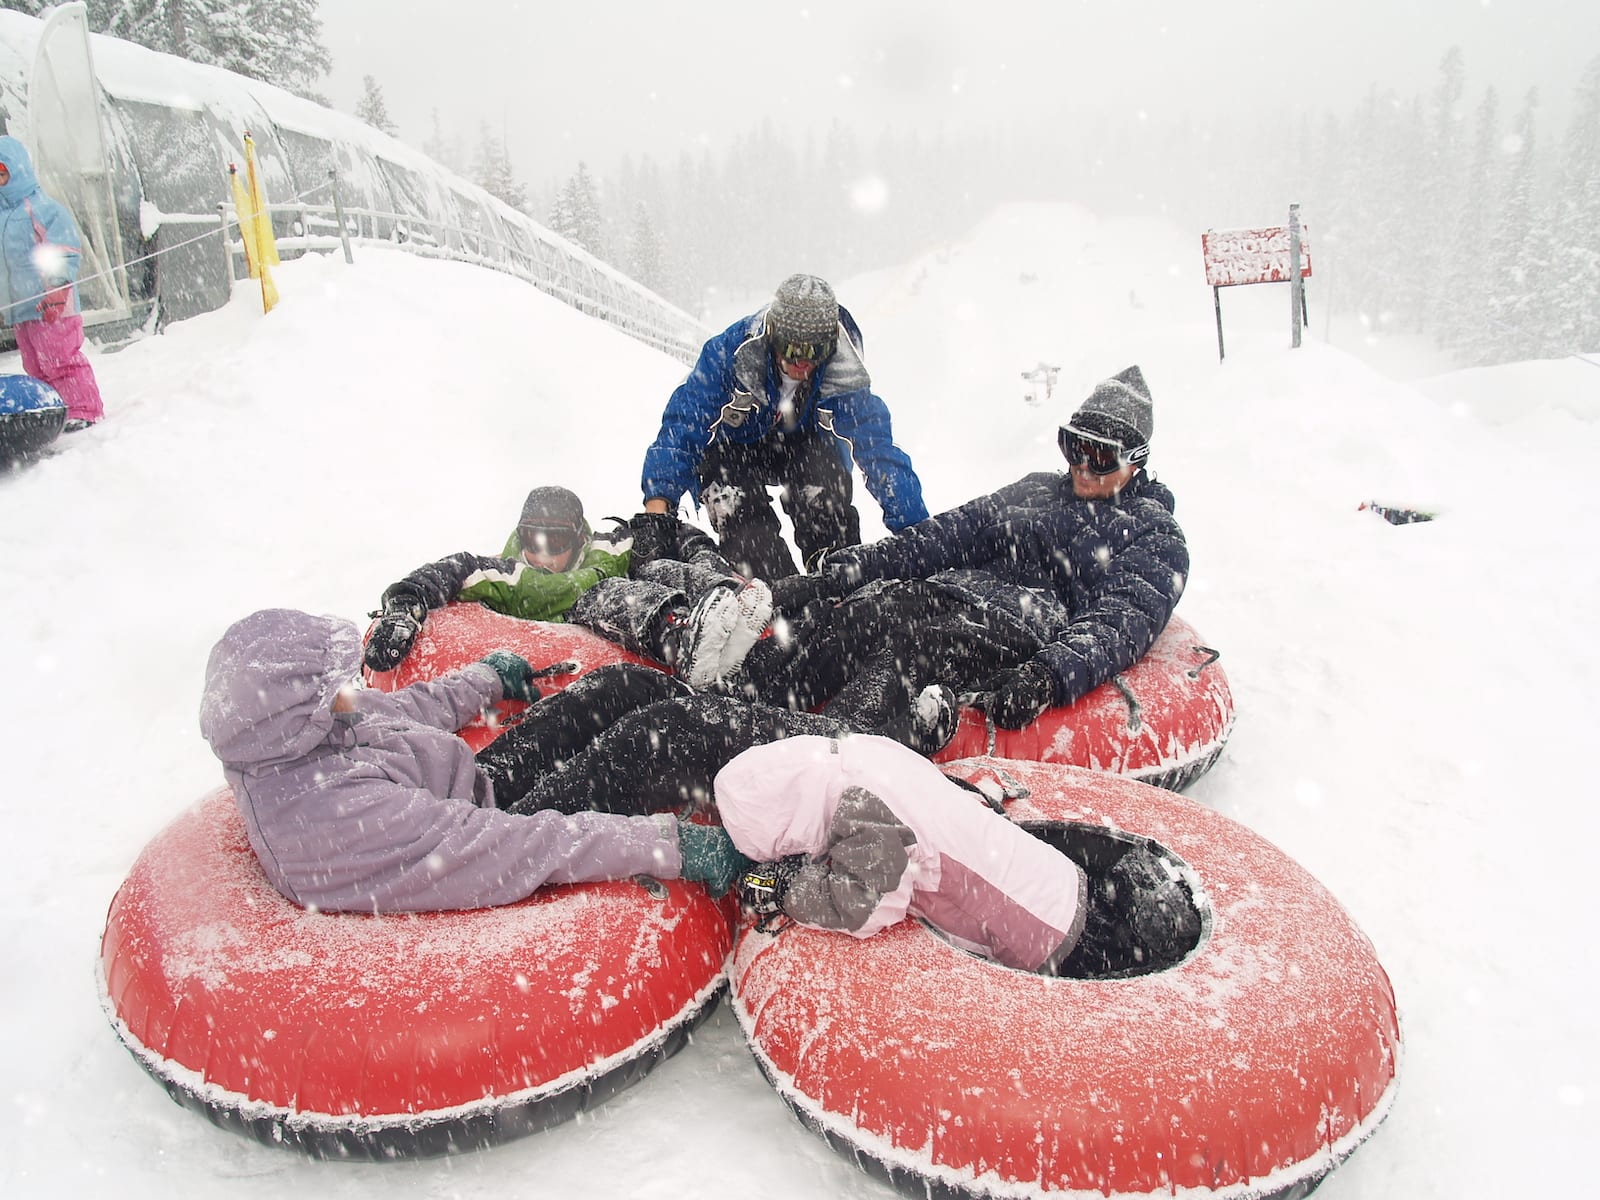 Keystone Resort Snow Tubing Hill Group